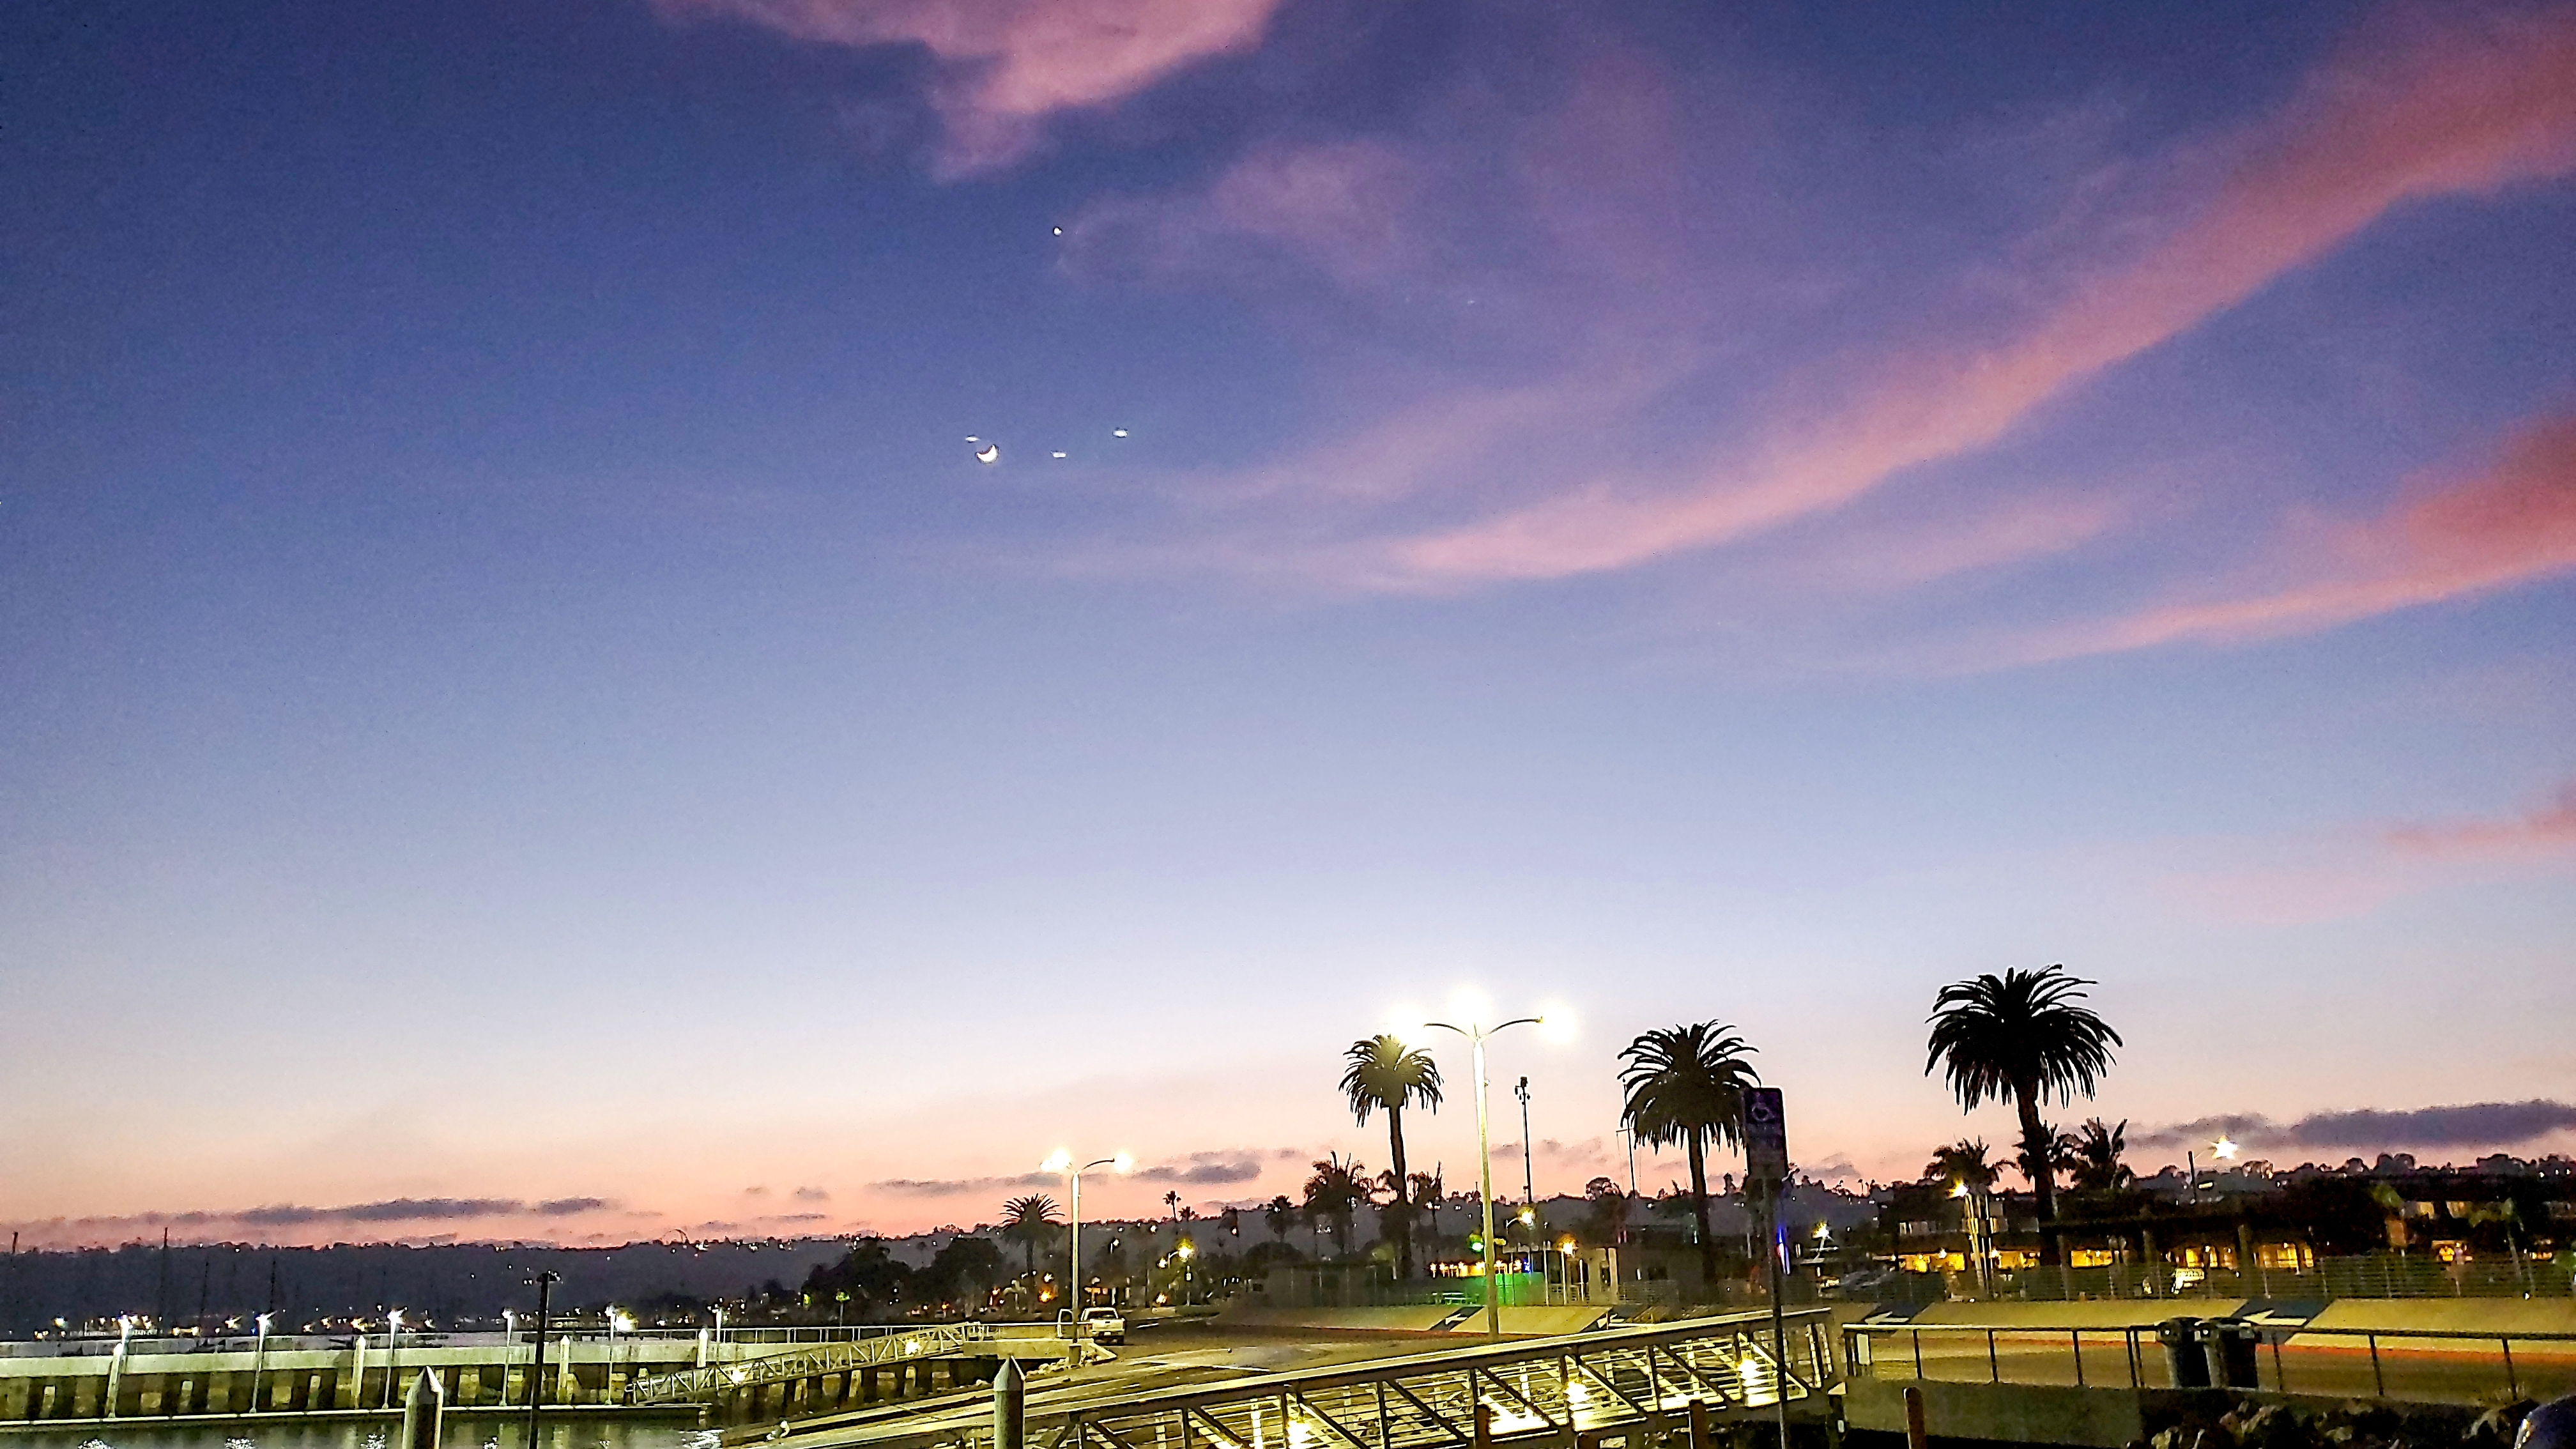 San Diego, California (United States)